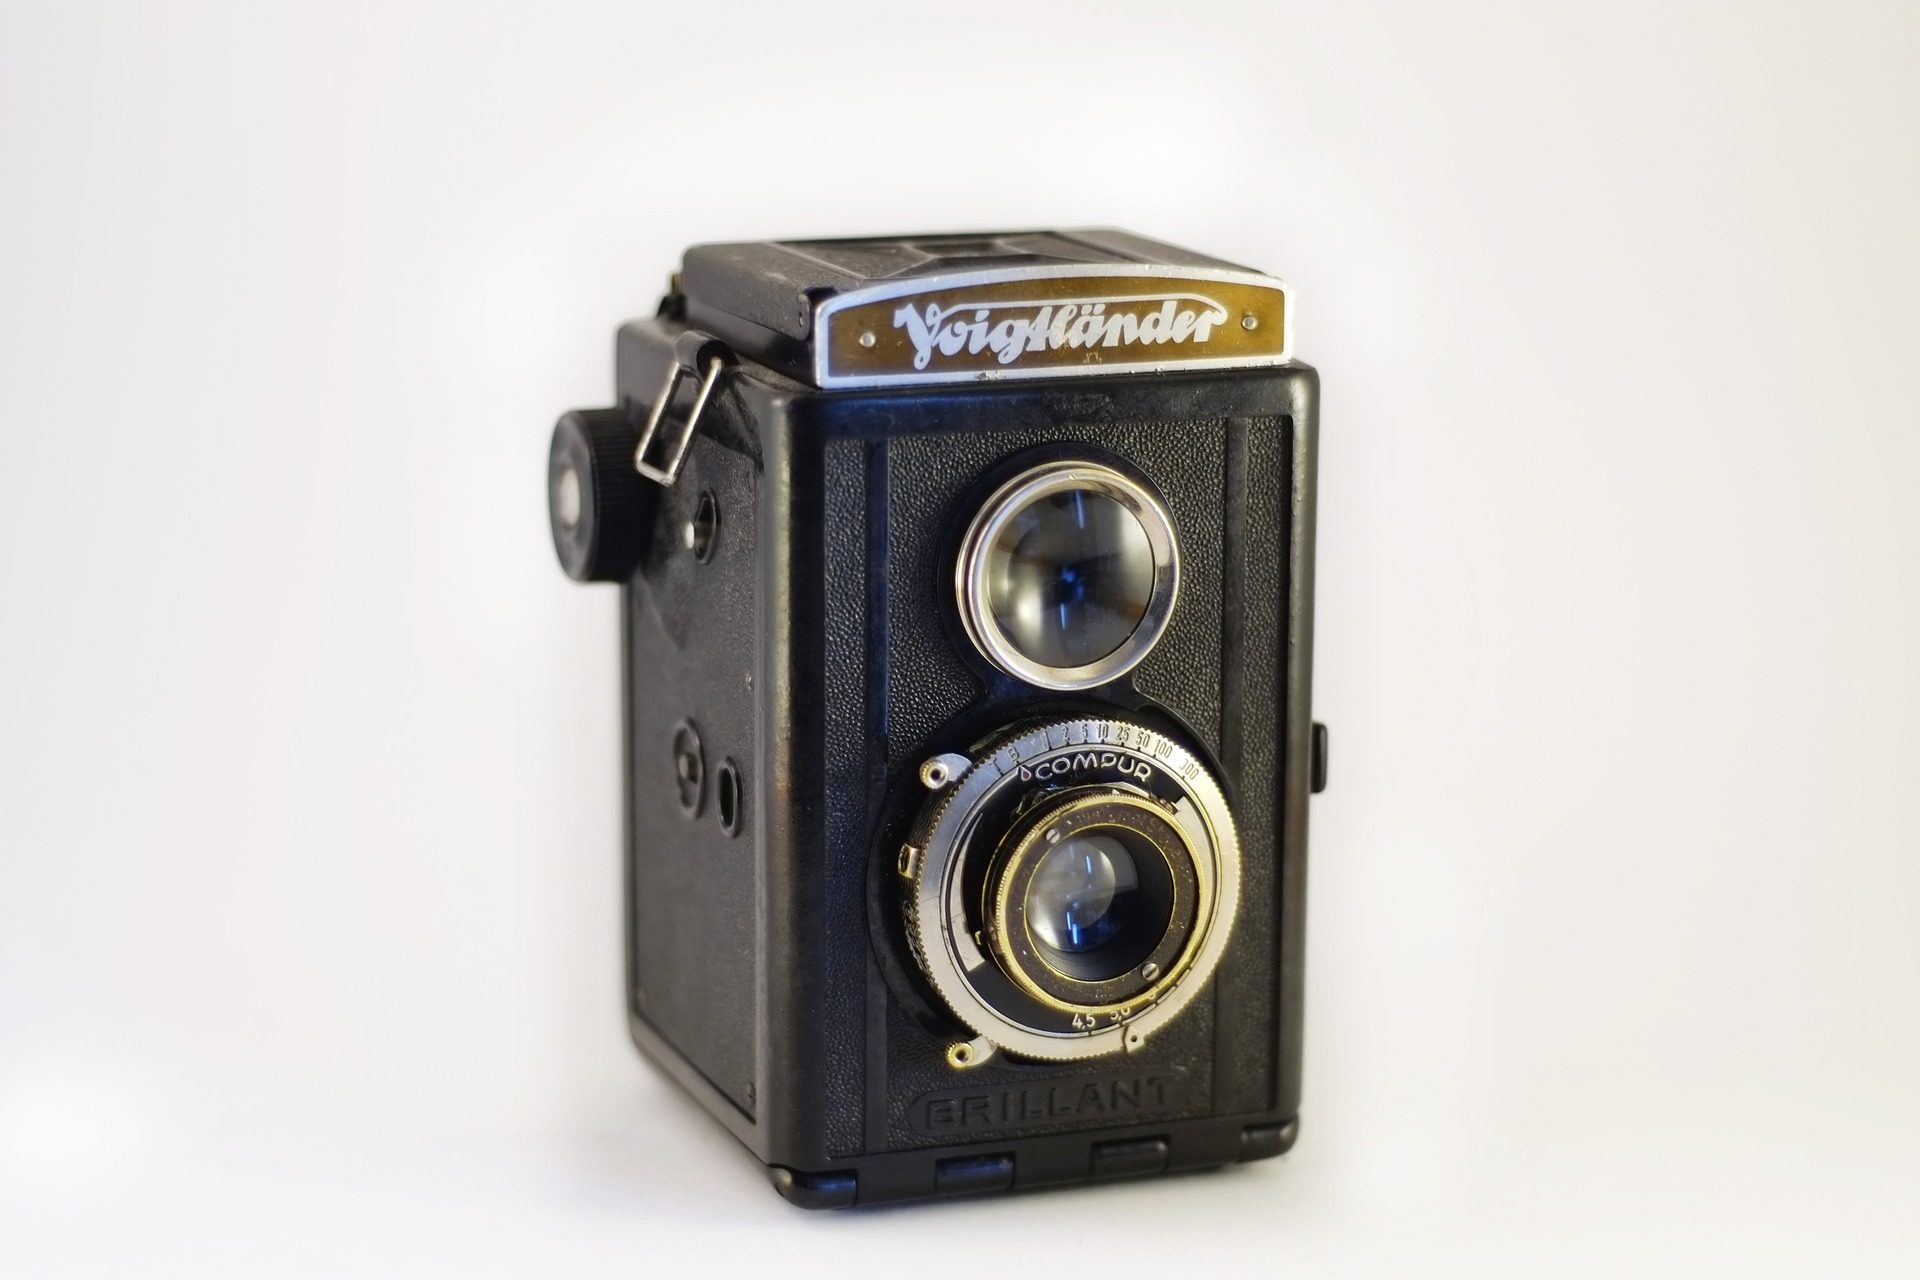 cámara, fotográfica, vieja, antigua, vintage, clásica - Fondos de Pantalla HD - professor-falken.com